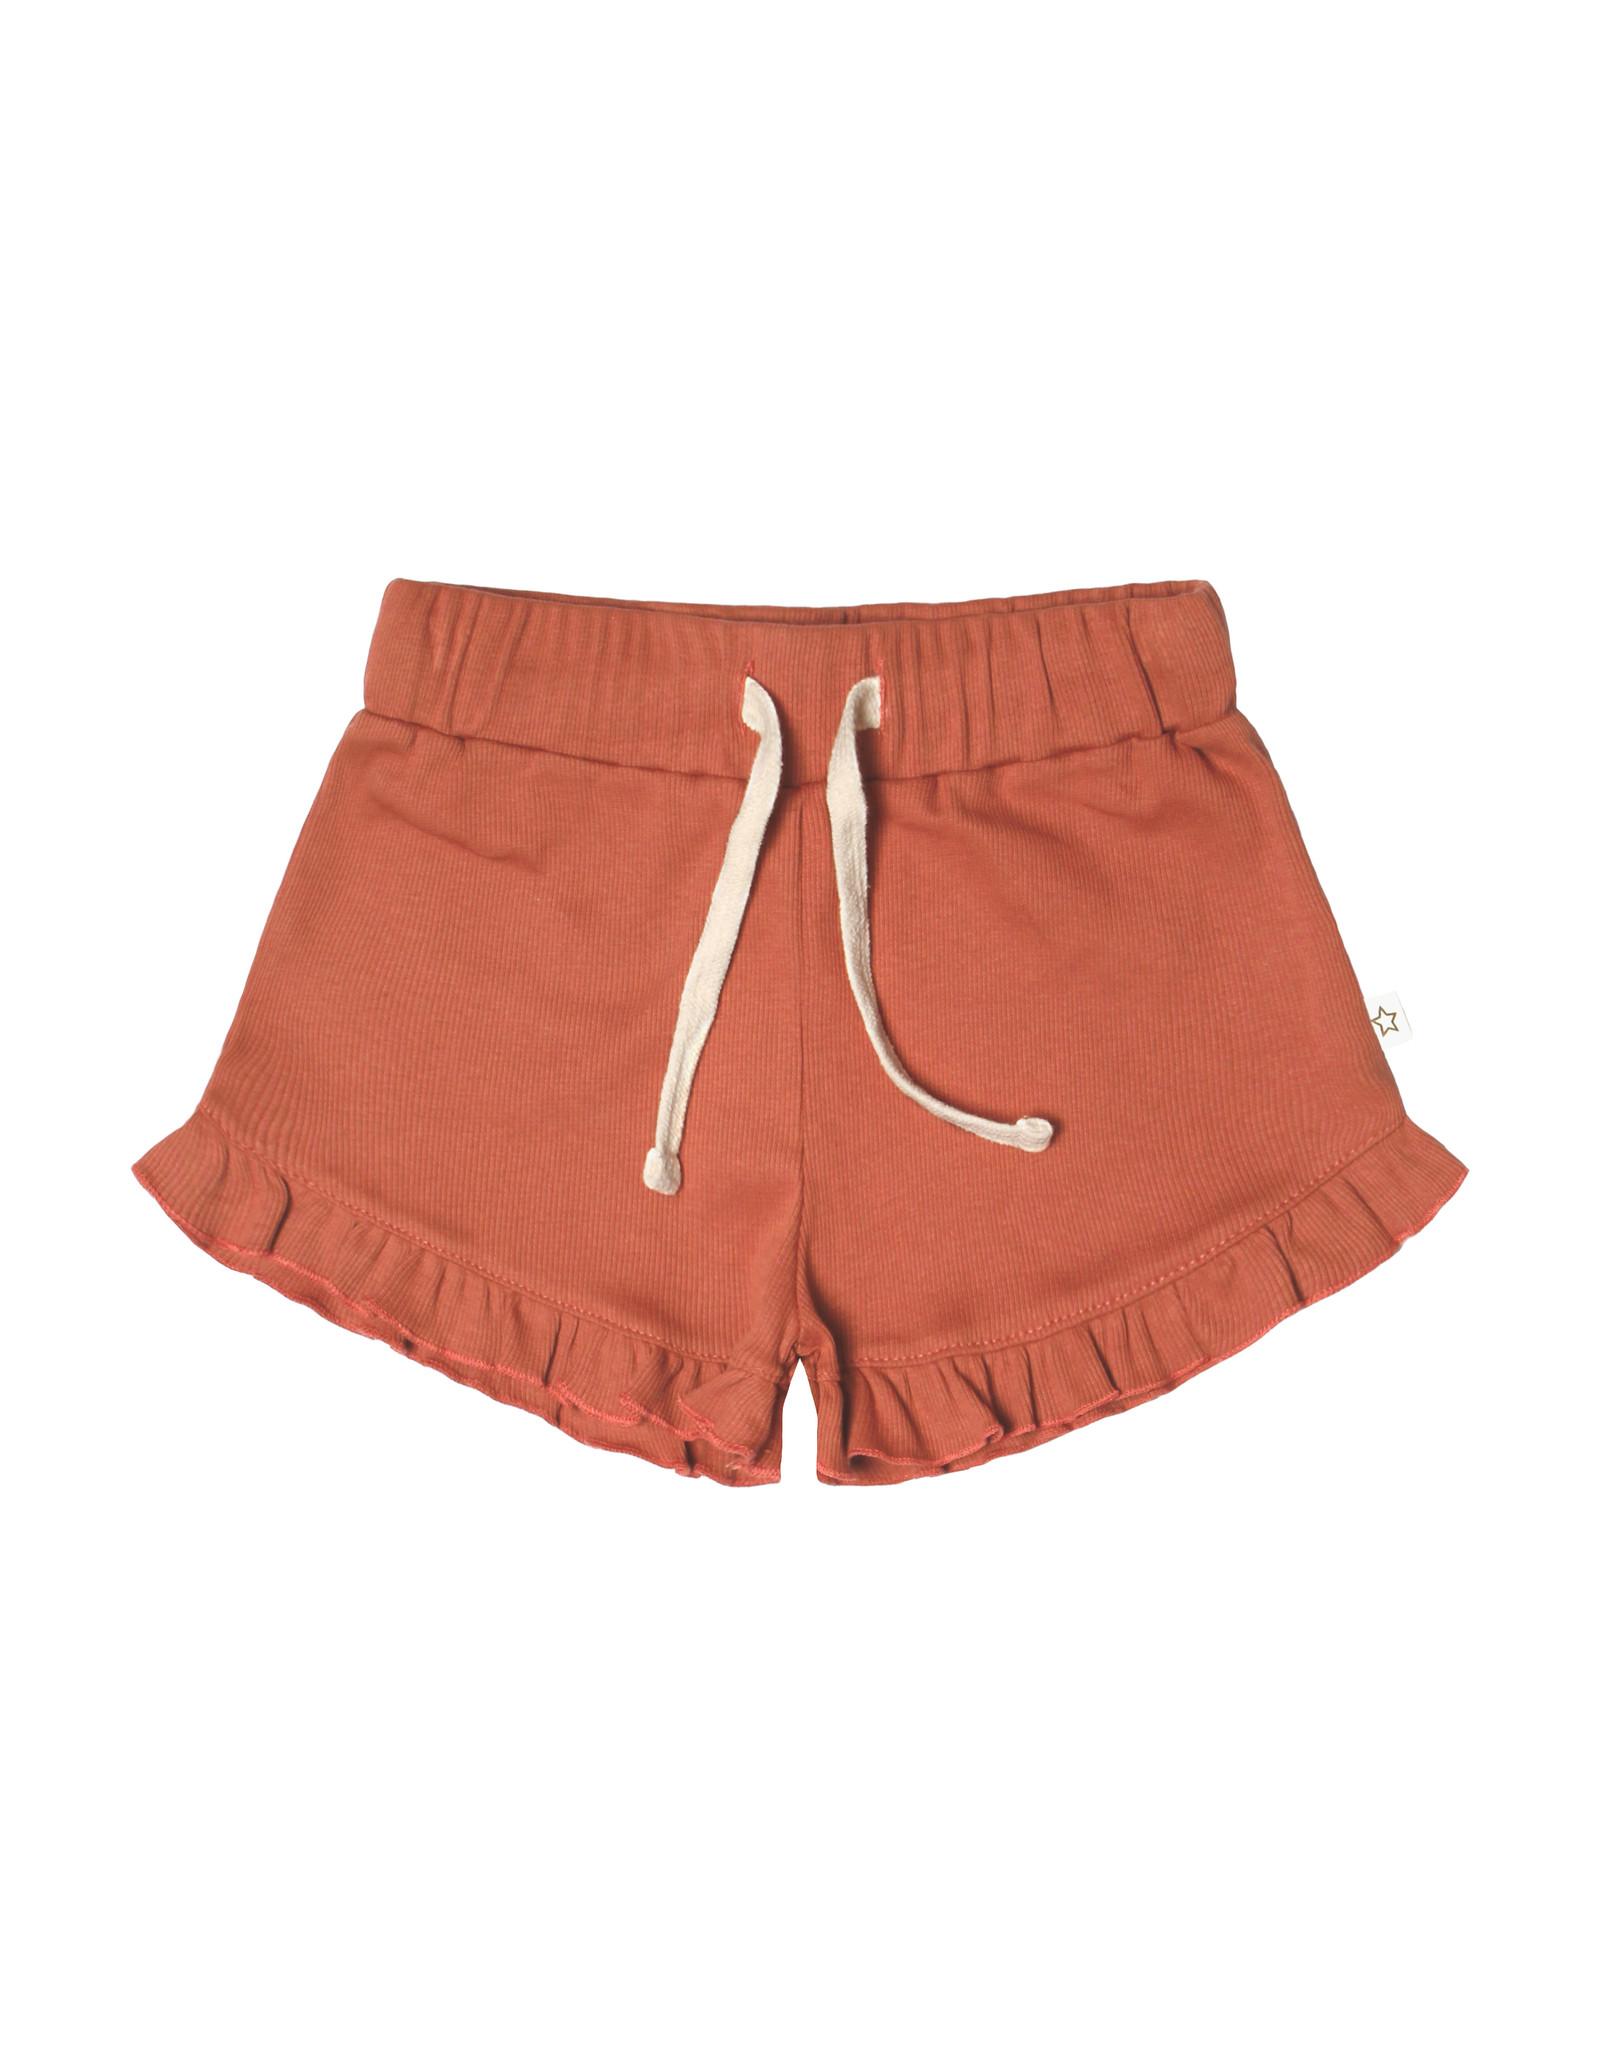 Your Wishes Rib Terra | Ruffle Shorts